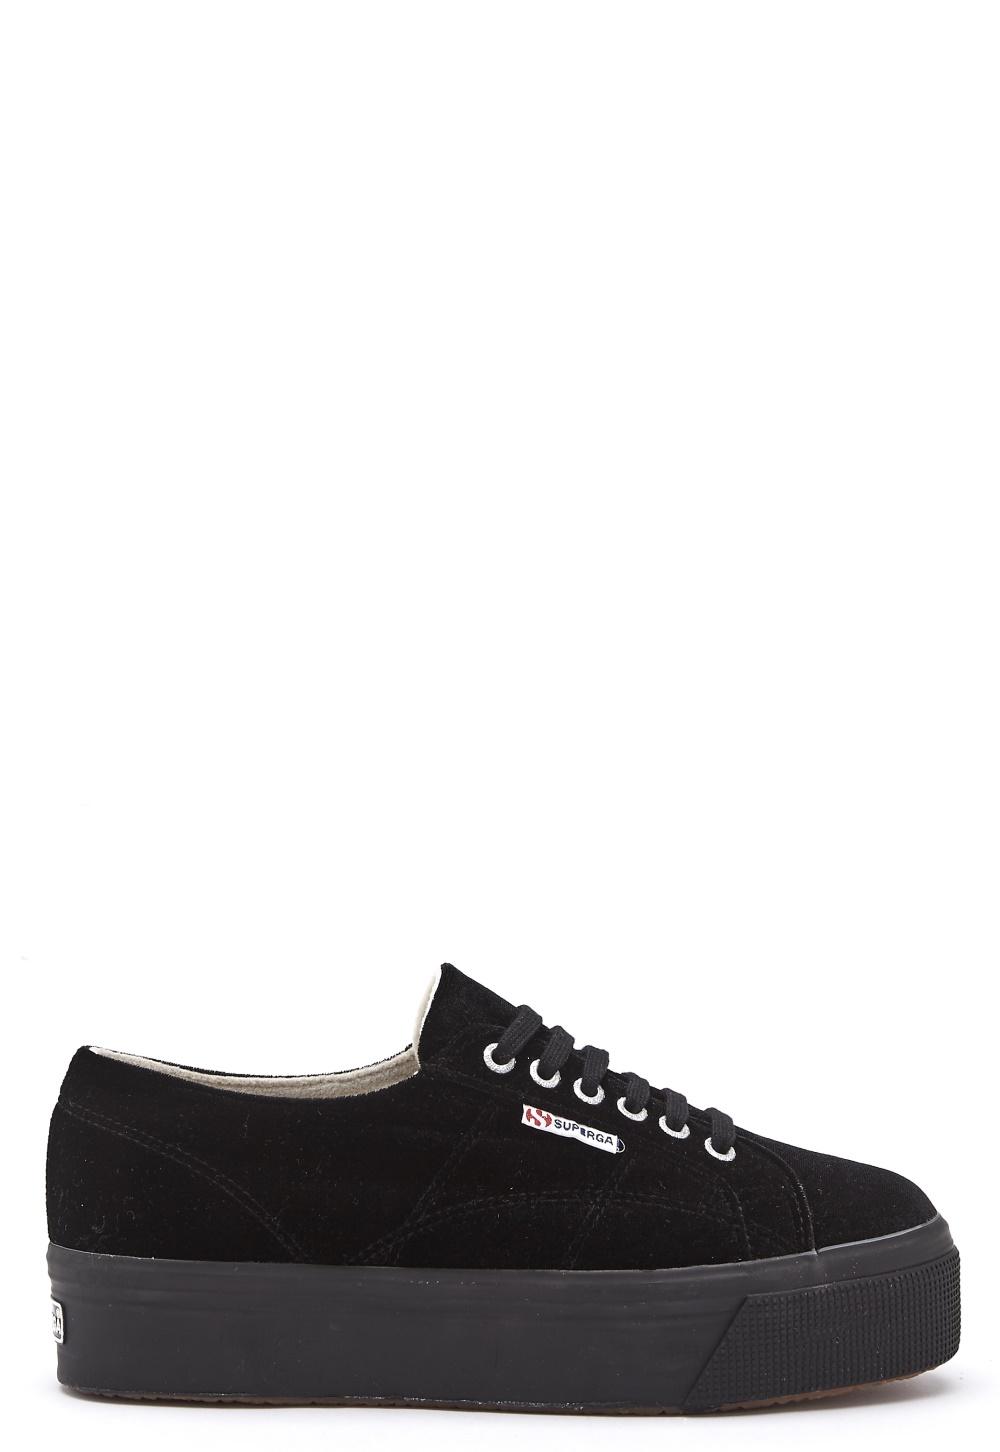 Superga Velvet Sneakers Black - Bubbleroom